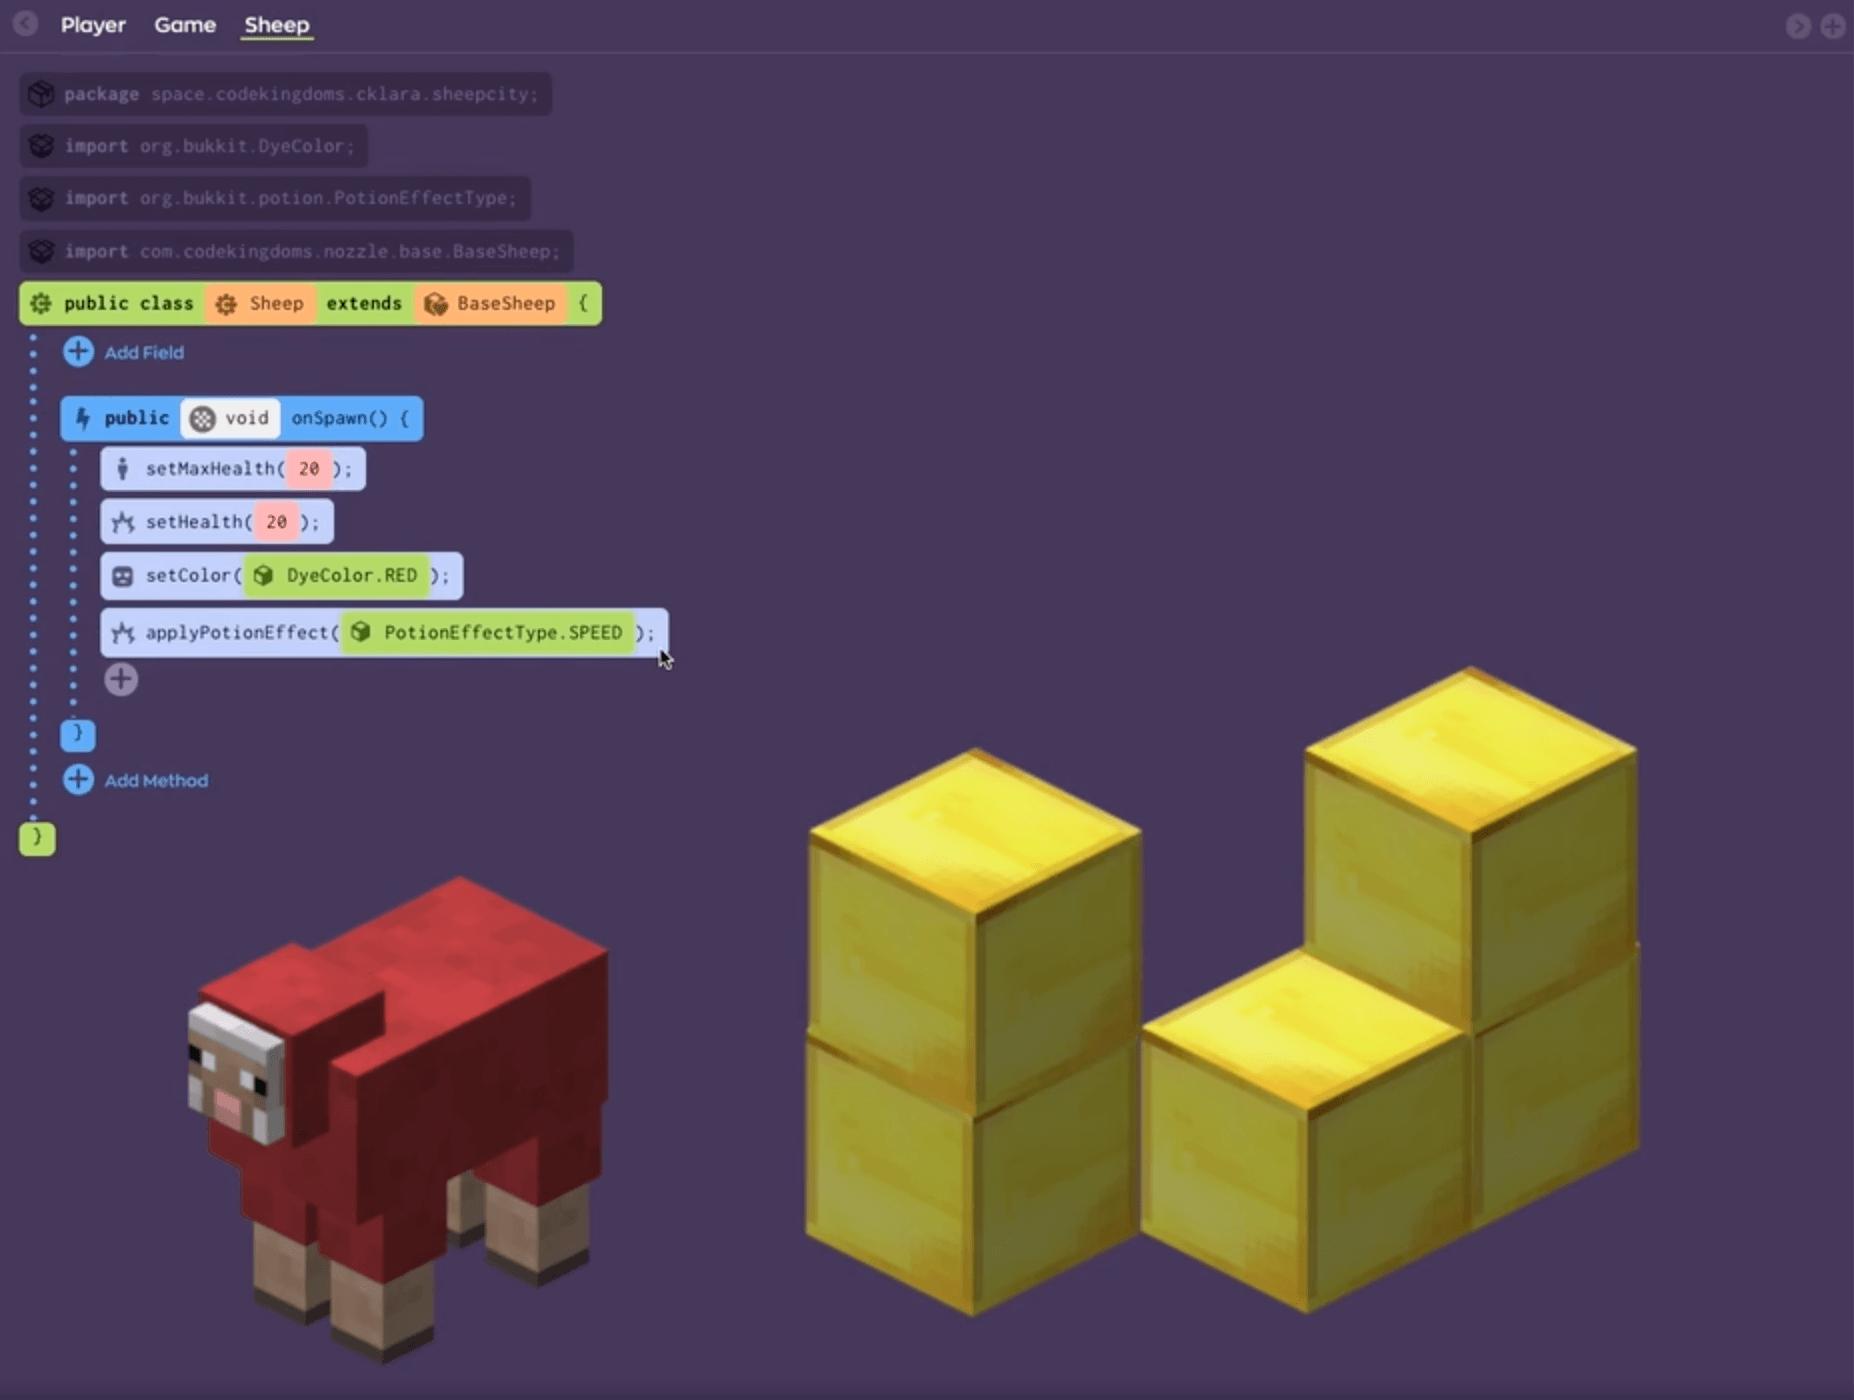 minecraft modding camp, virtual tech camp, java code